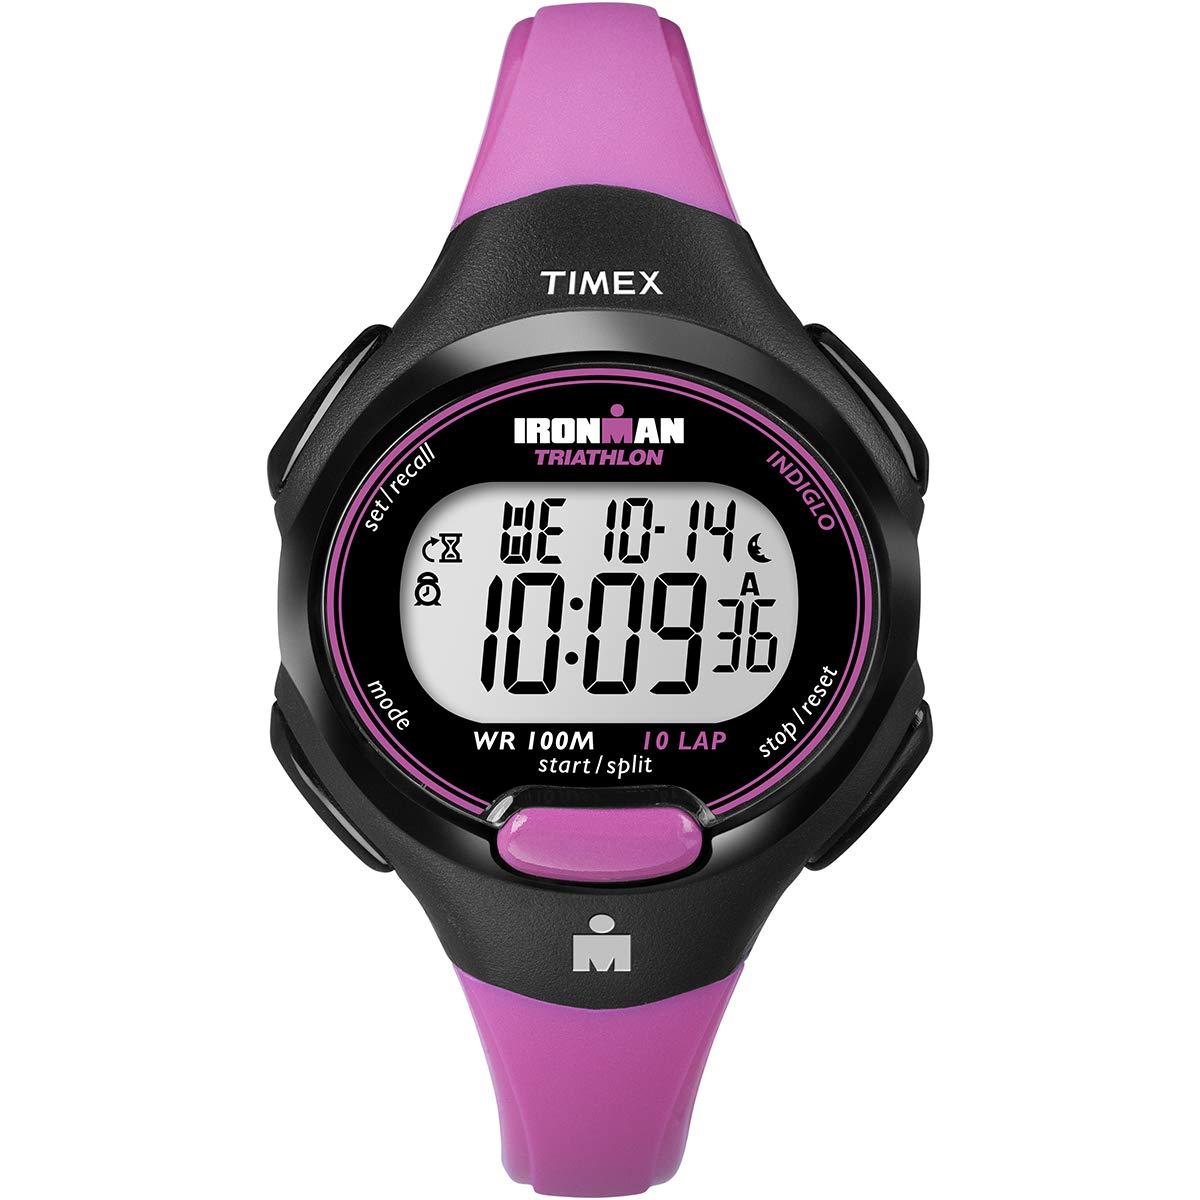 Timex T5K525Wmns Ironman Digi Reloj Rosa con Correa de 10 Vueltas ...